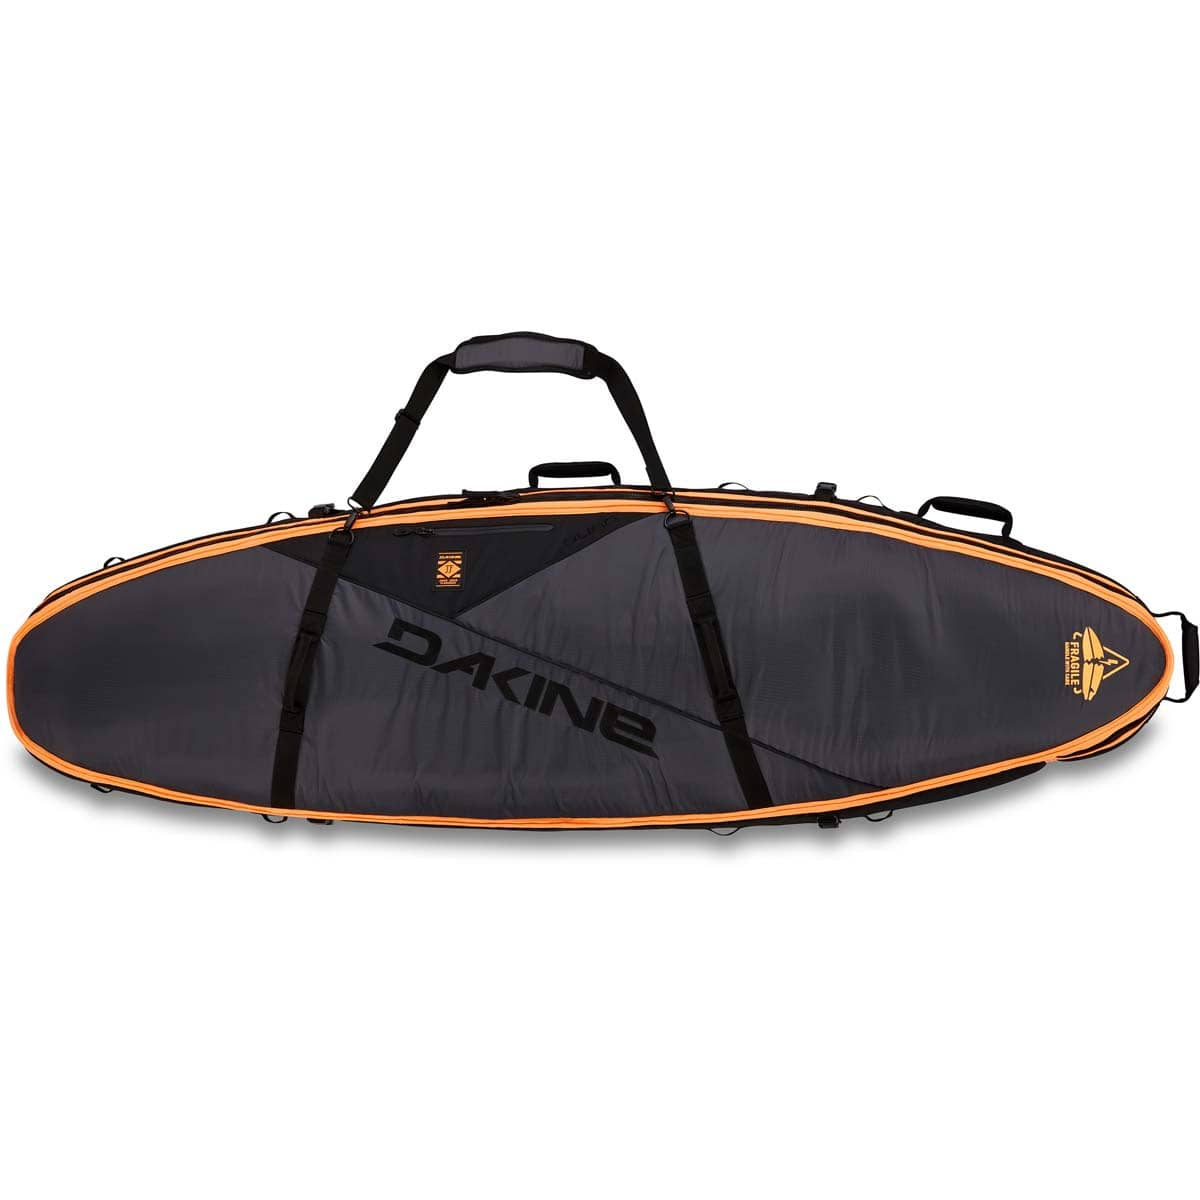 Dakine Board Sleeve Bag